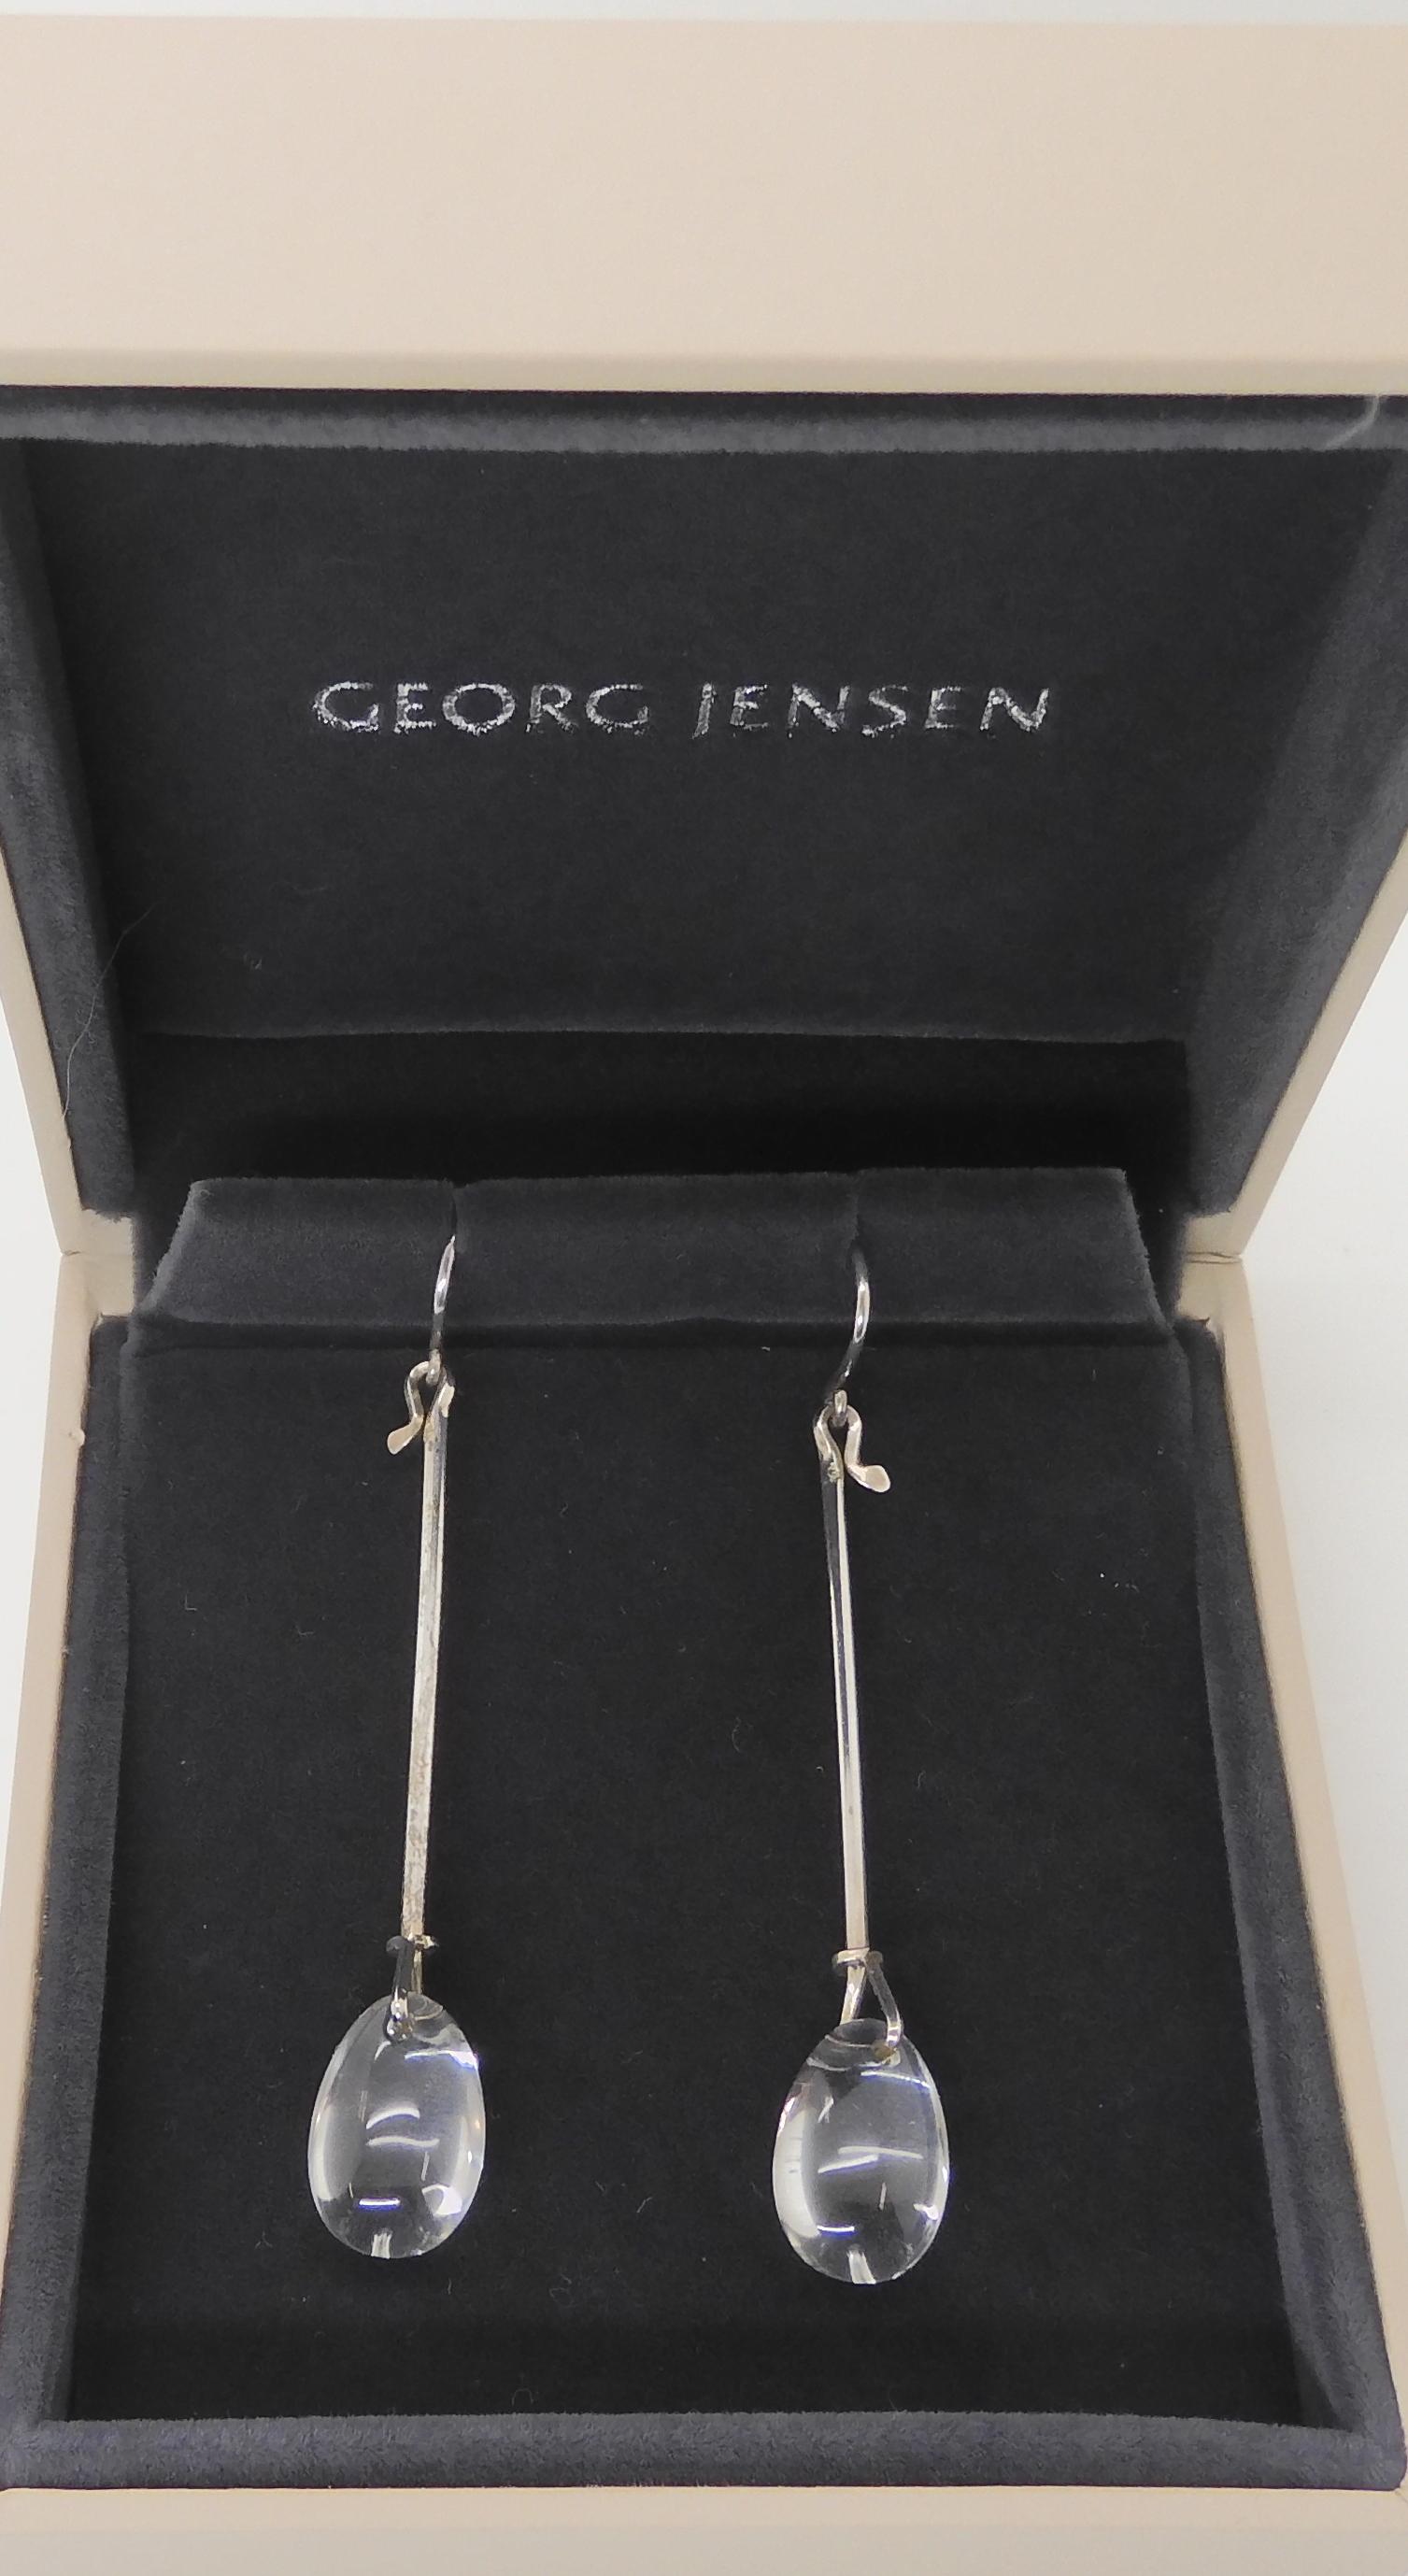 A PAIR OF GEORG JENSEN CRYSTAL DEW DROP EARRINGS designed by Vivianna Torun Bulow-Hube for Jensen.